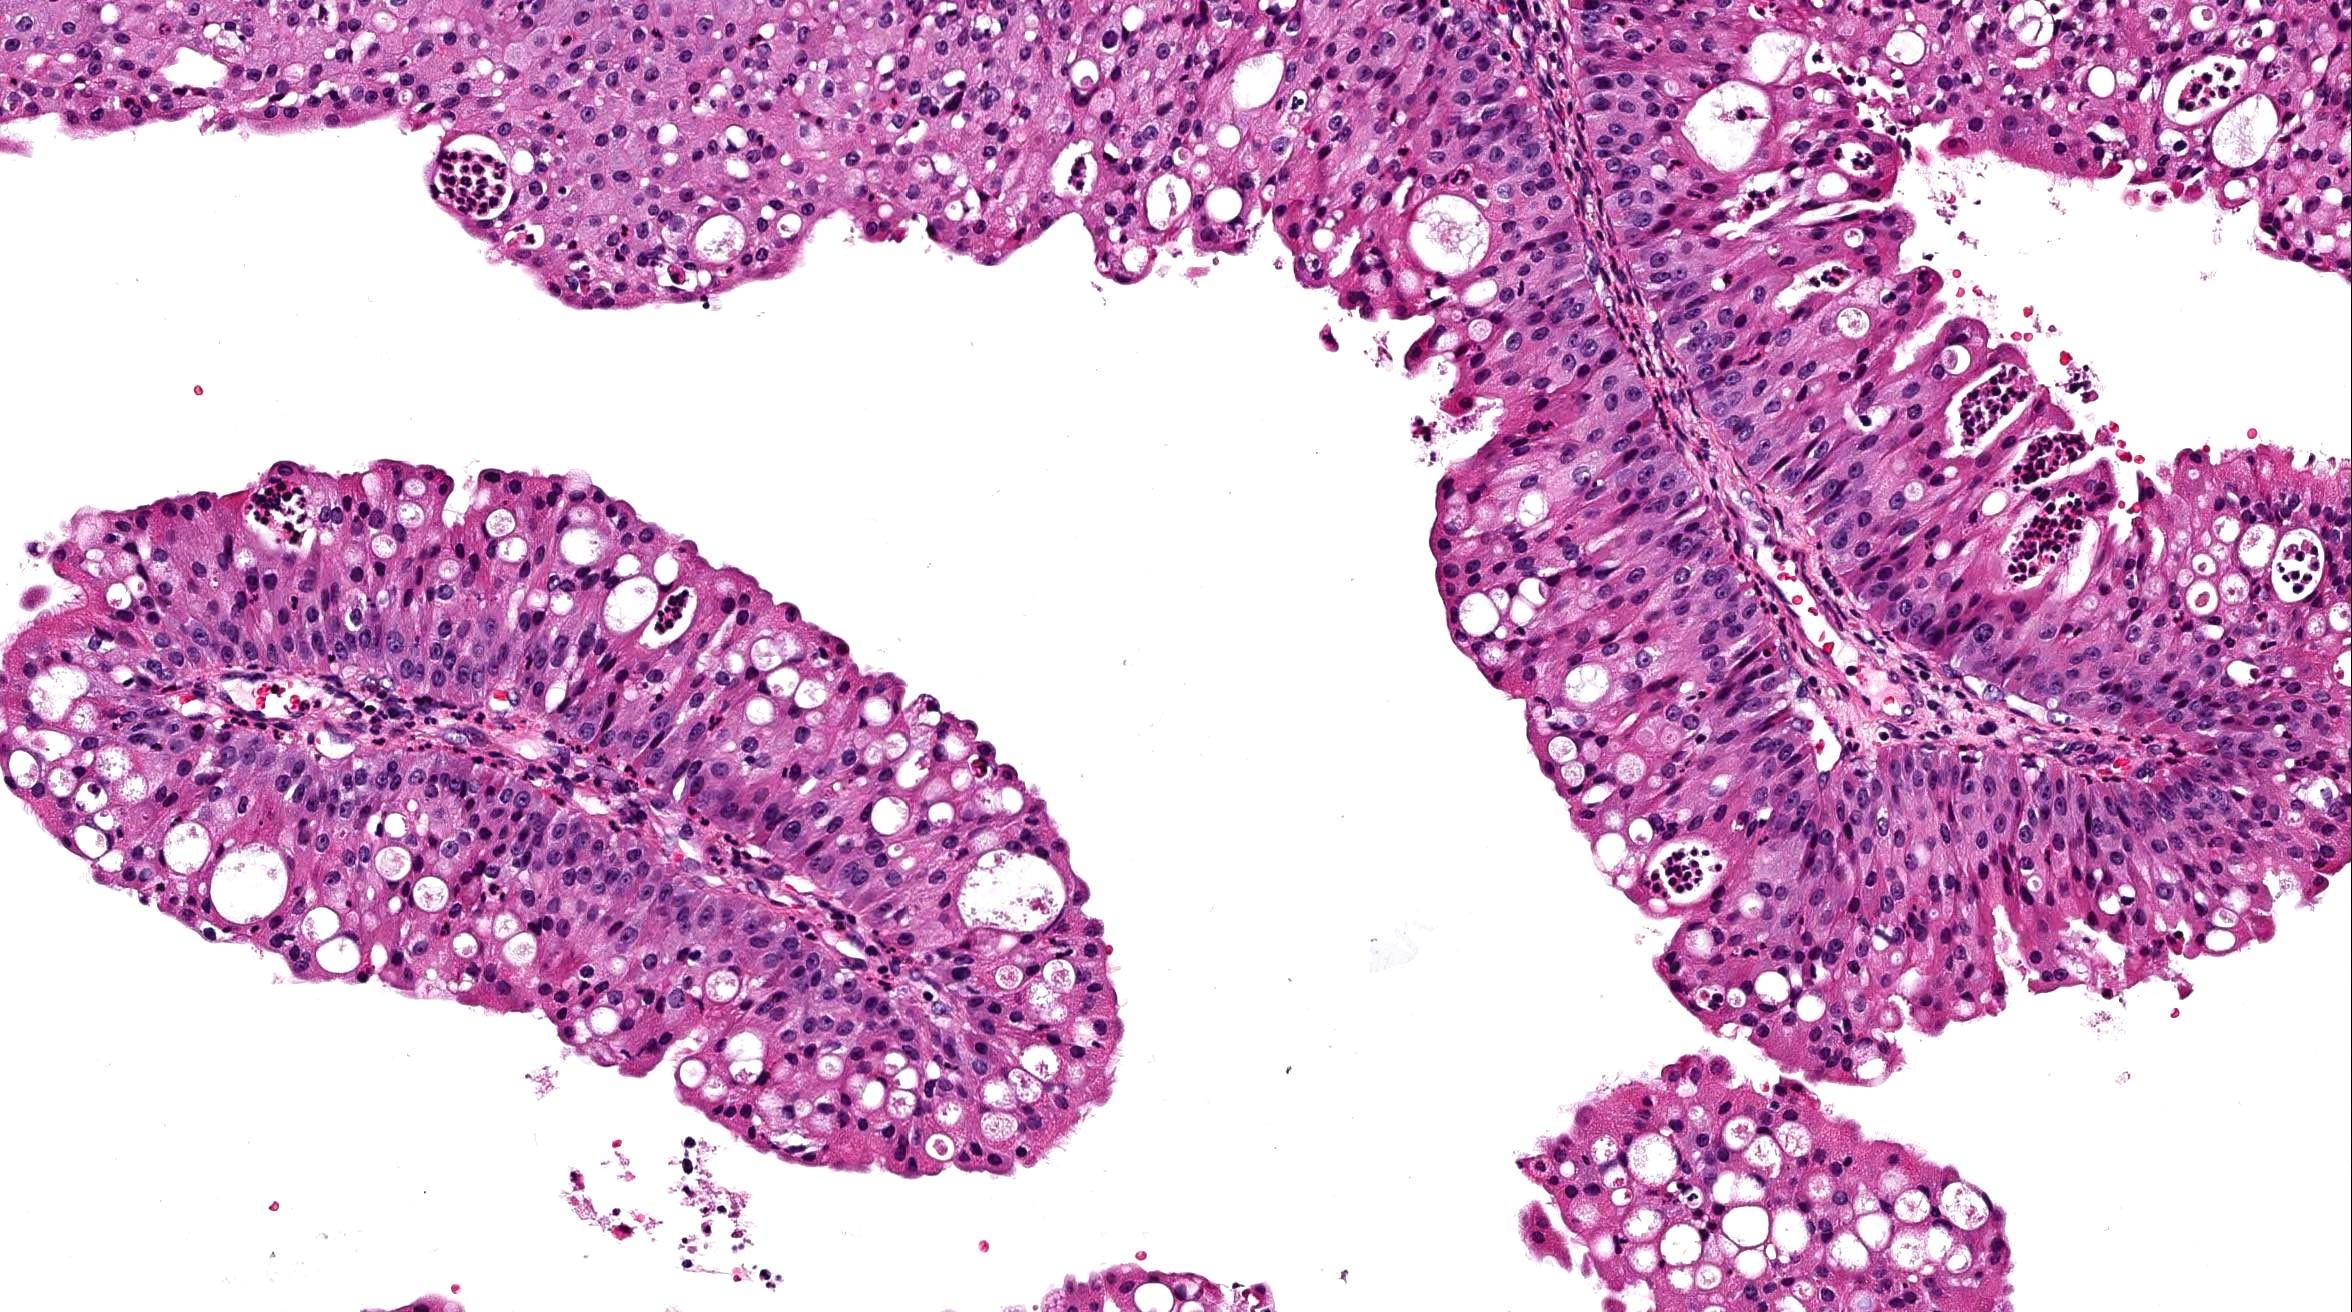 schneiderian papilloma exophytic type causes of juvenile papillomatosis